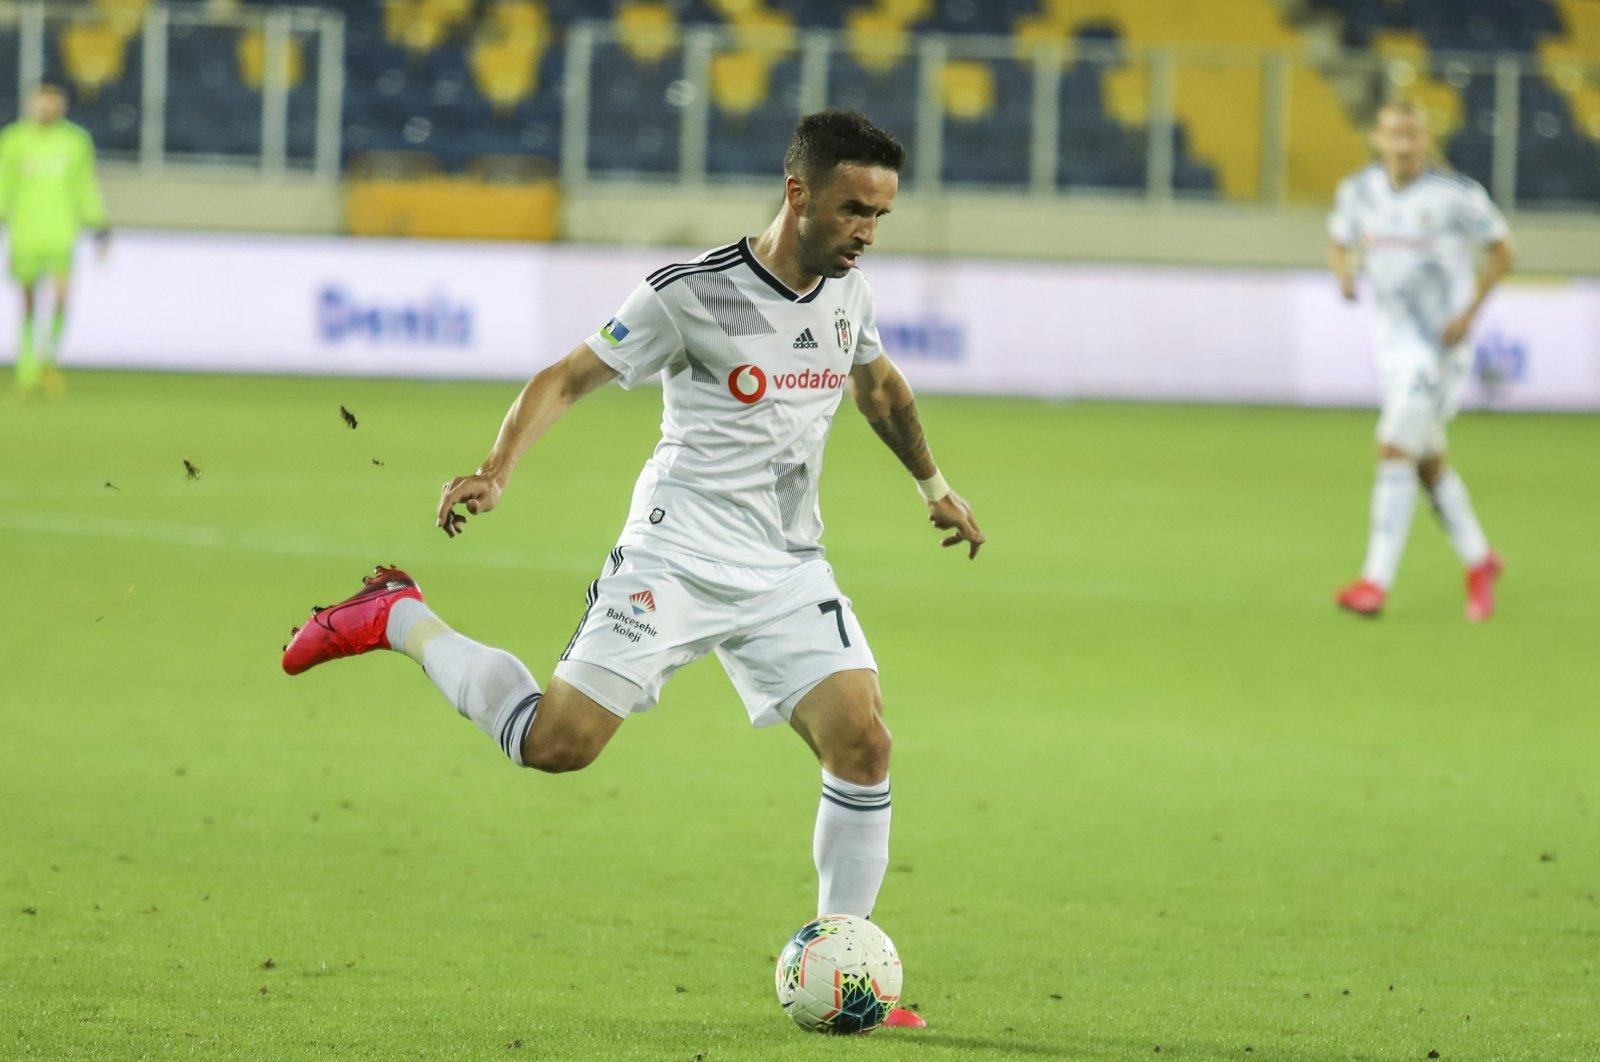 Beşiktaş's Gökhan Gönül passes the ball during a Süper Lig match against Gençlerbirliği in Ankara, Turkey, July 25, 2020. (IHA Photo)